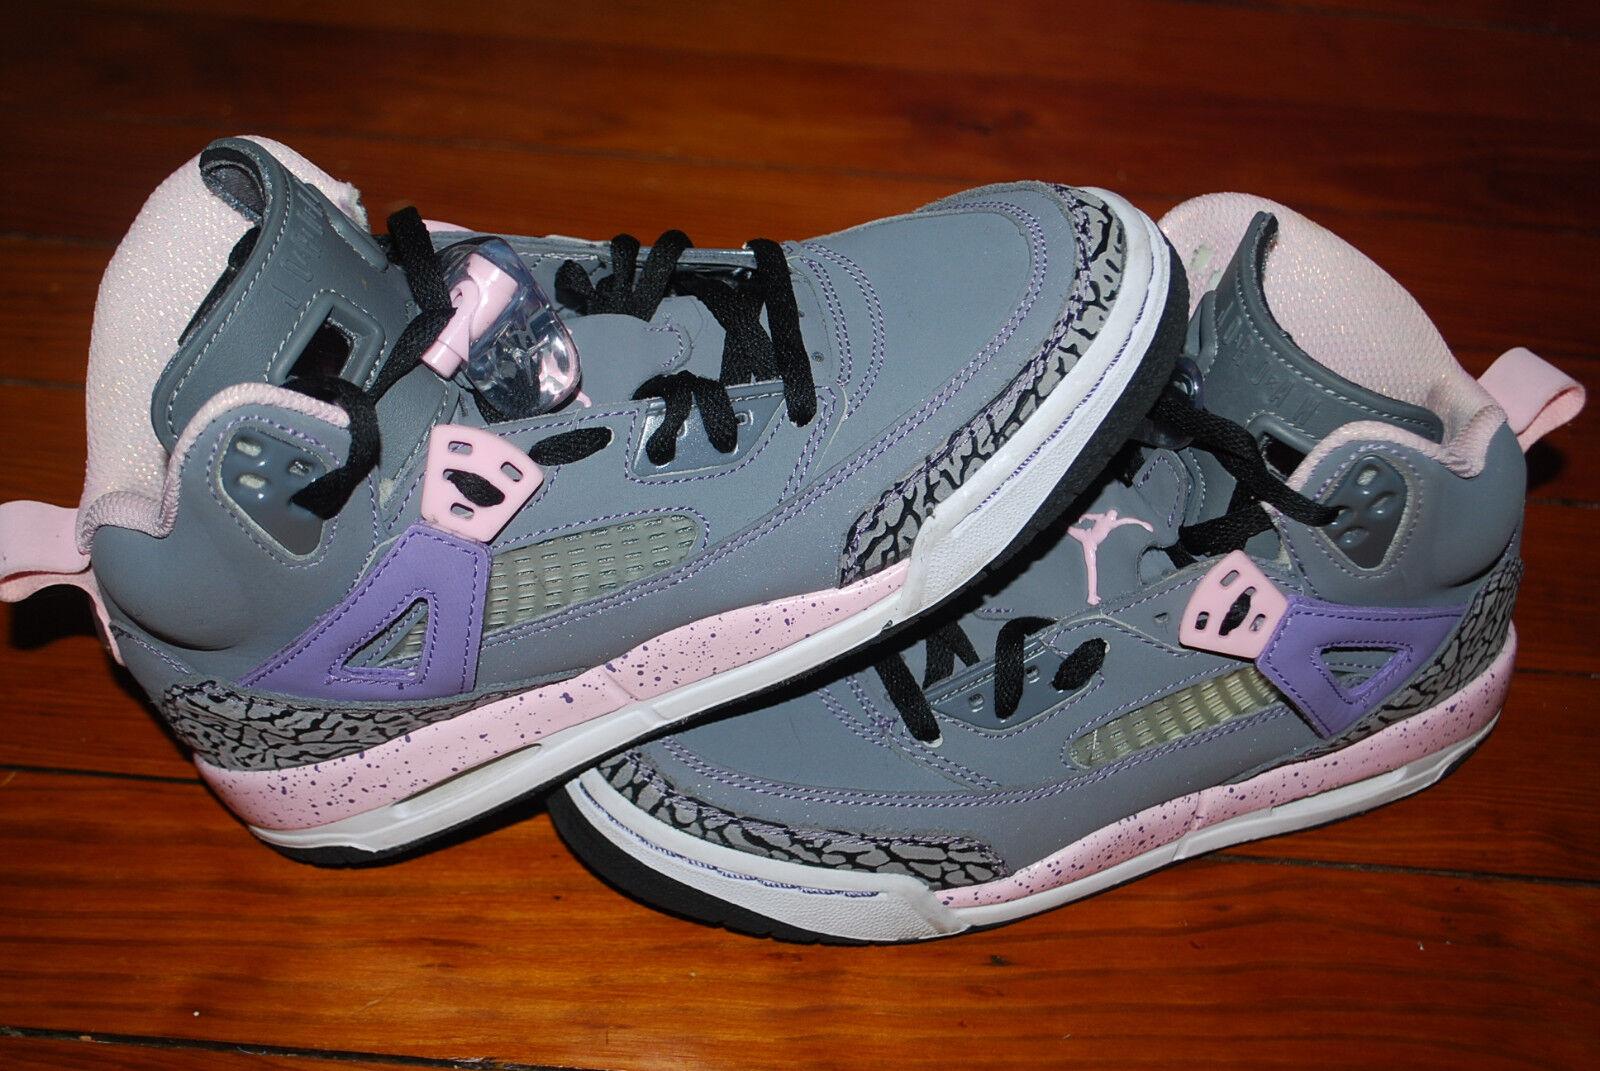 Air Jordan Spizike Liquid Pink Earth Purple Sneaker Price reduction 535712-028 Comfortable and good-looking